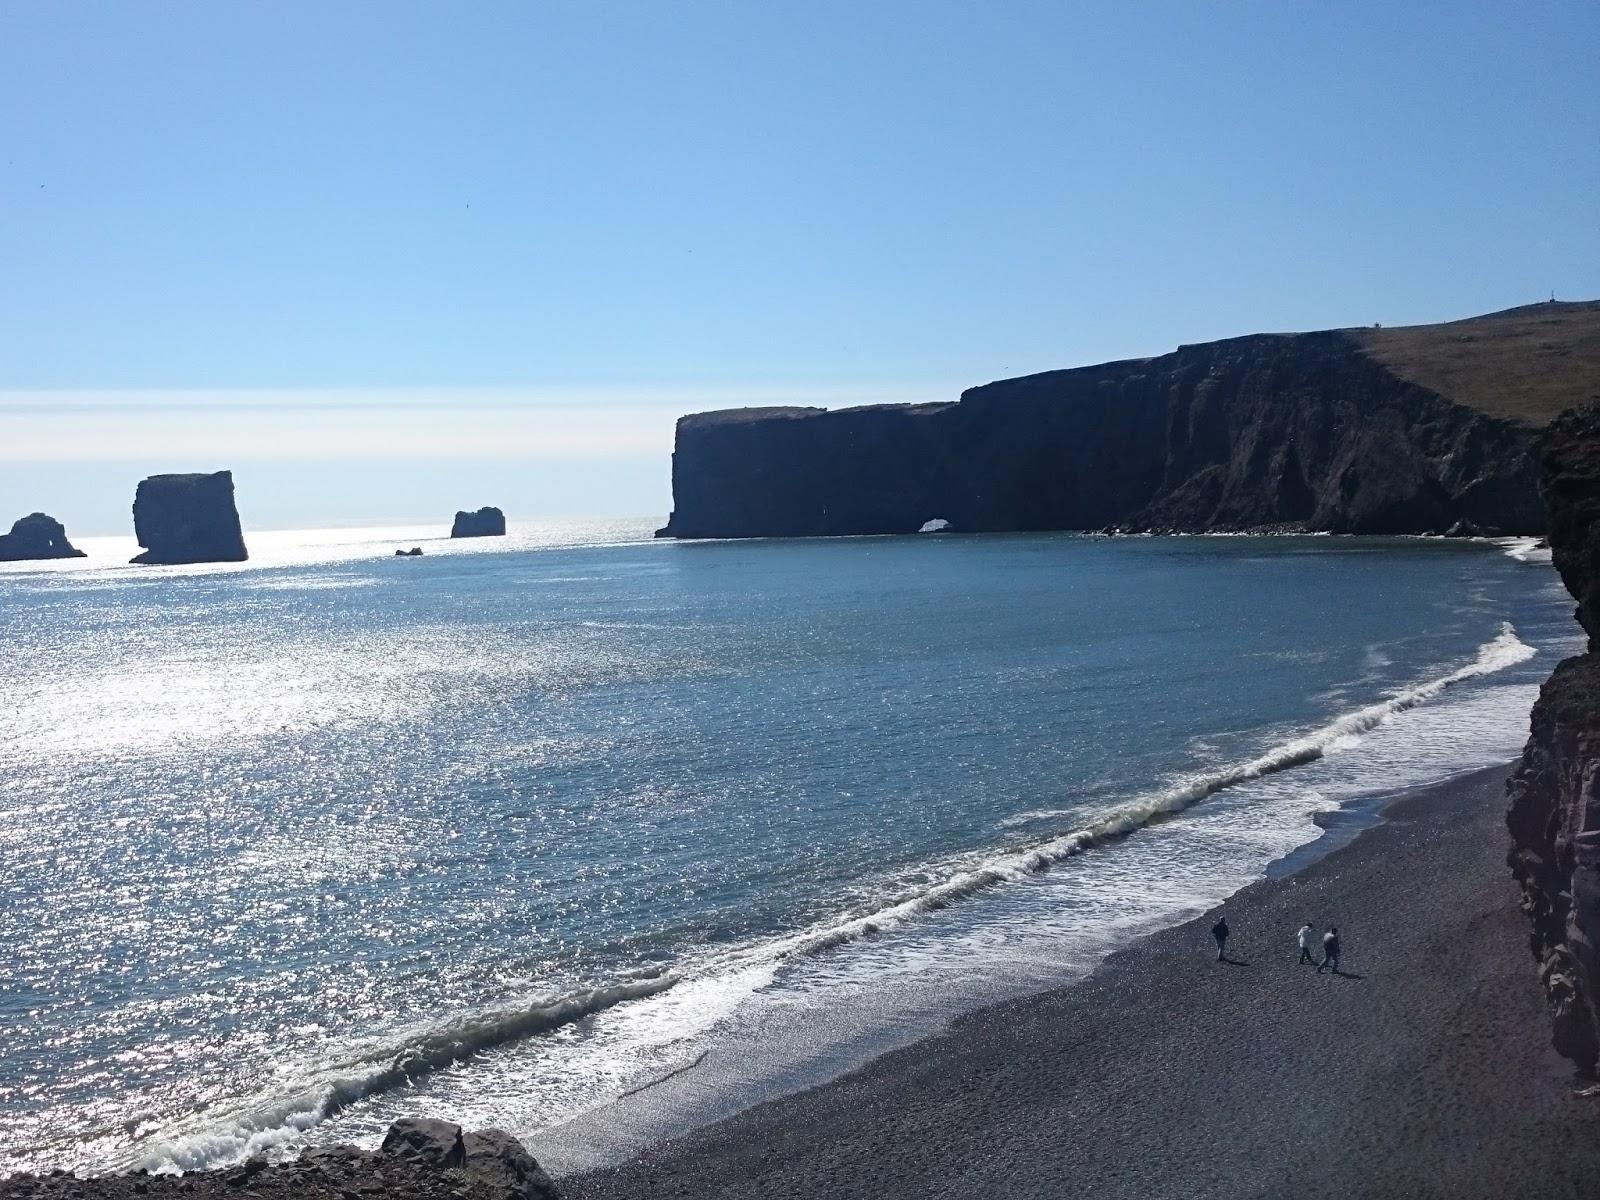 Reynisfjara, czarna plaża, Islandia, blog o Islandii, ocean, islandzki krajobraz